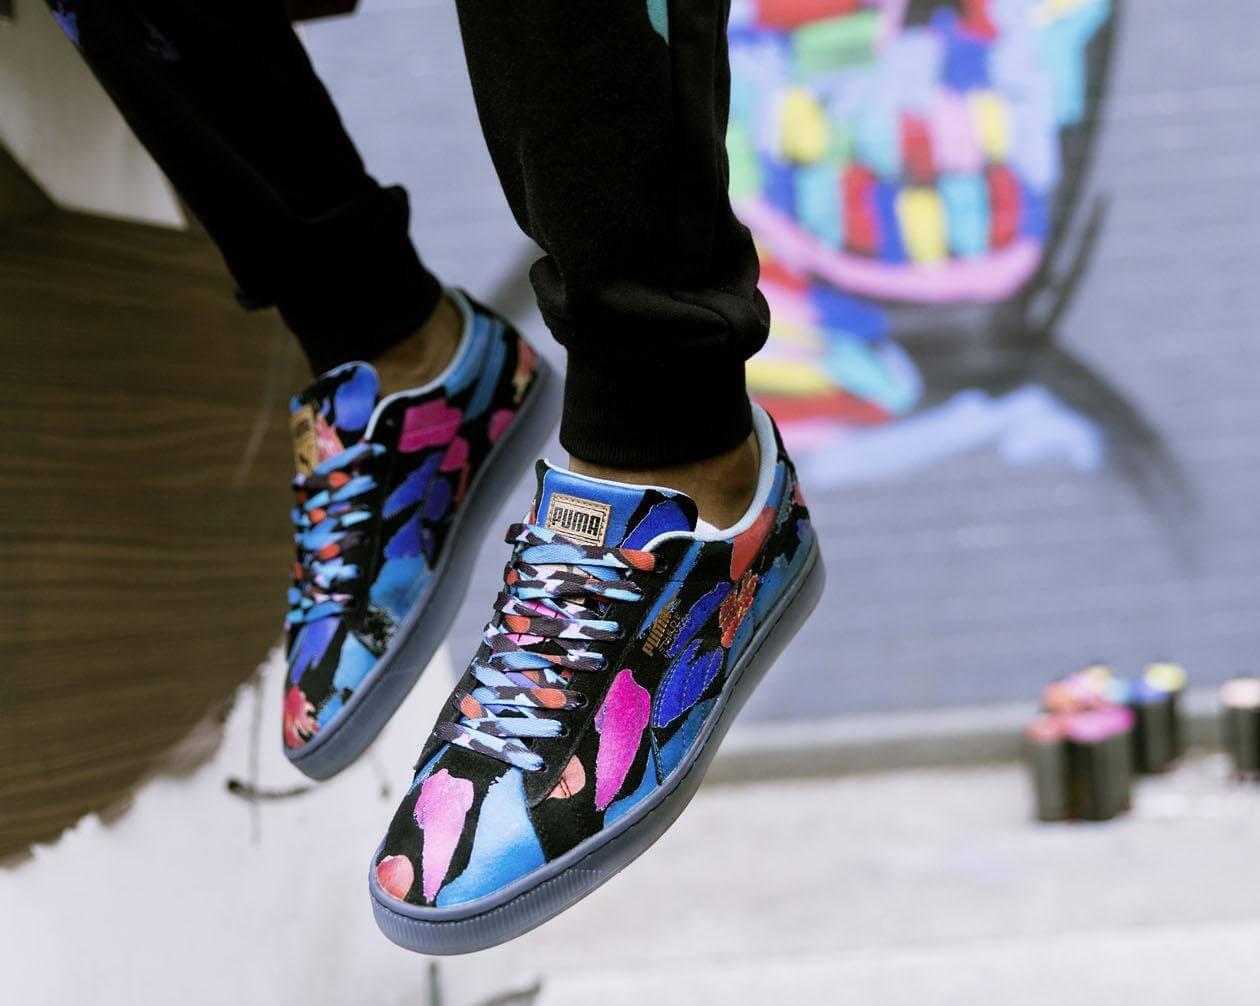 Sneakers recomendados por ACC ¡Llévele, llévele!